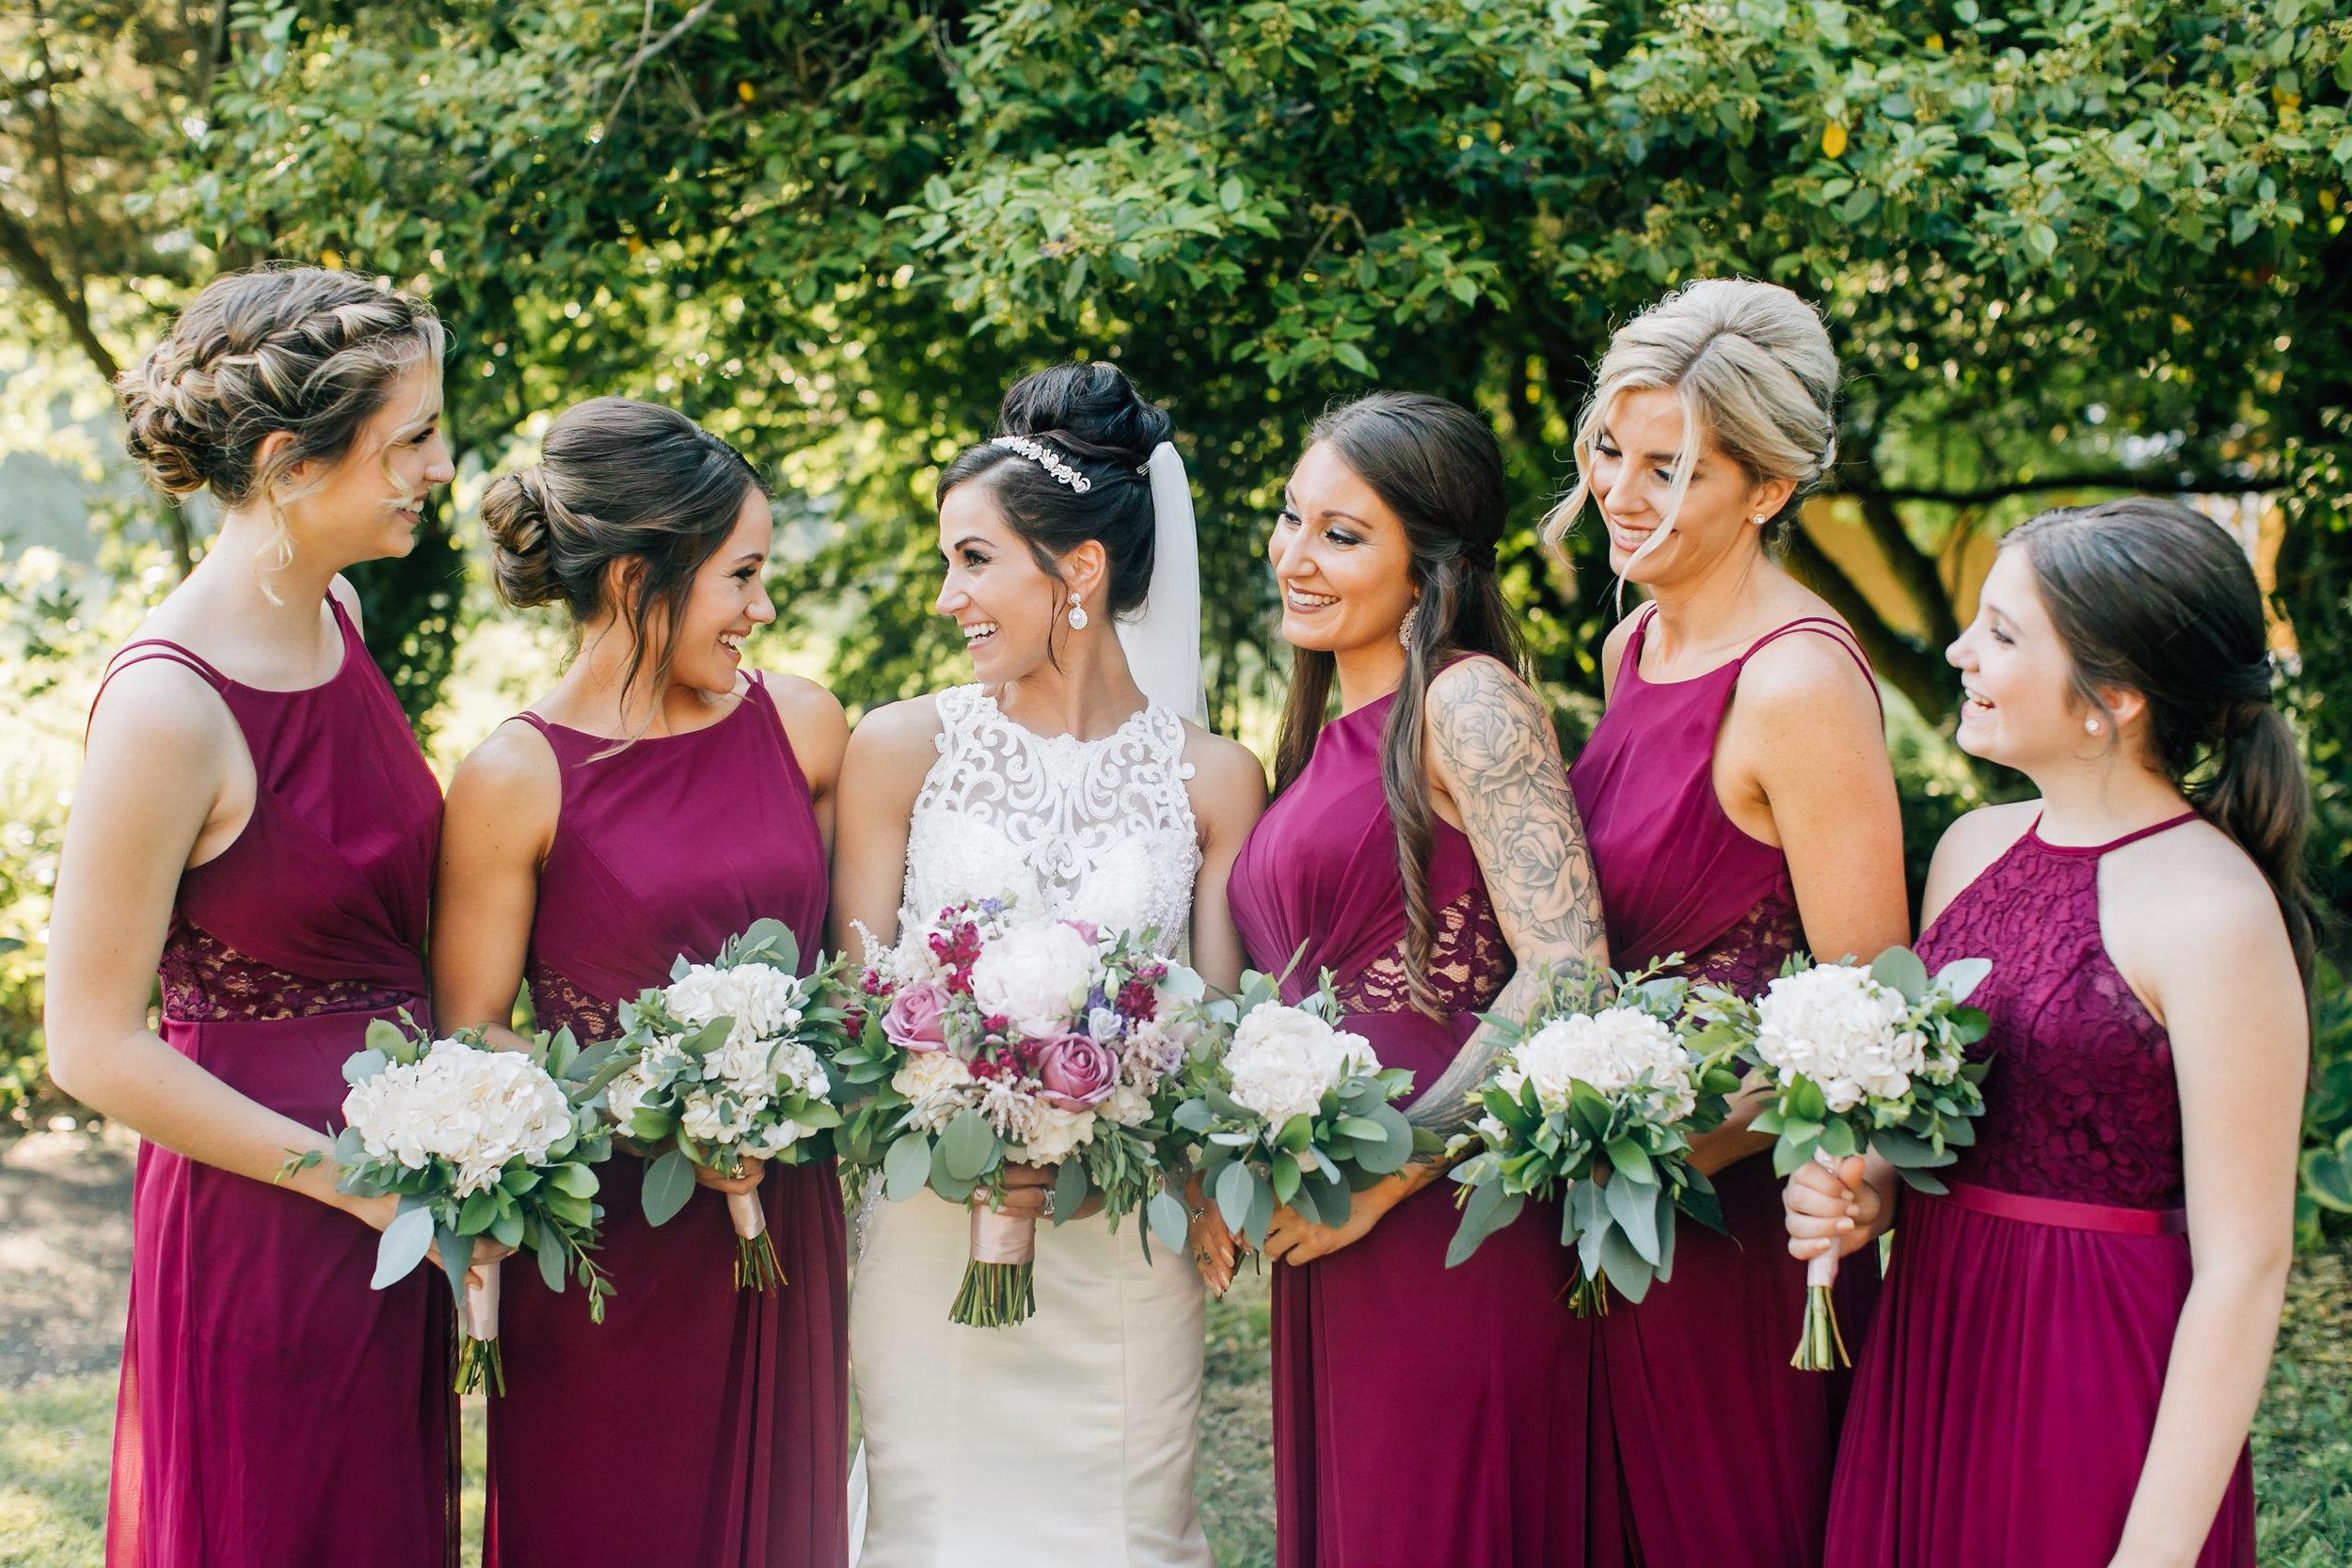 MagdalenaStudios_WeddingPhotographer_WillowCreekWinery_CarissaJoe-375.jpg